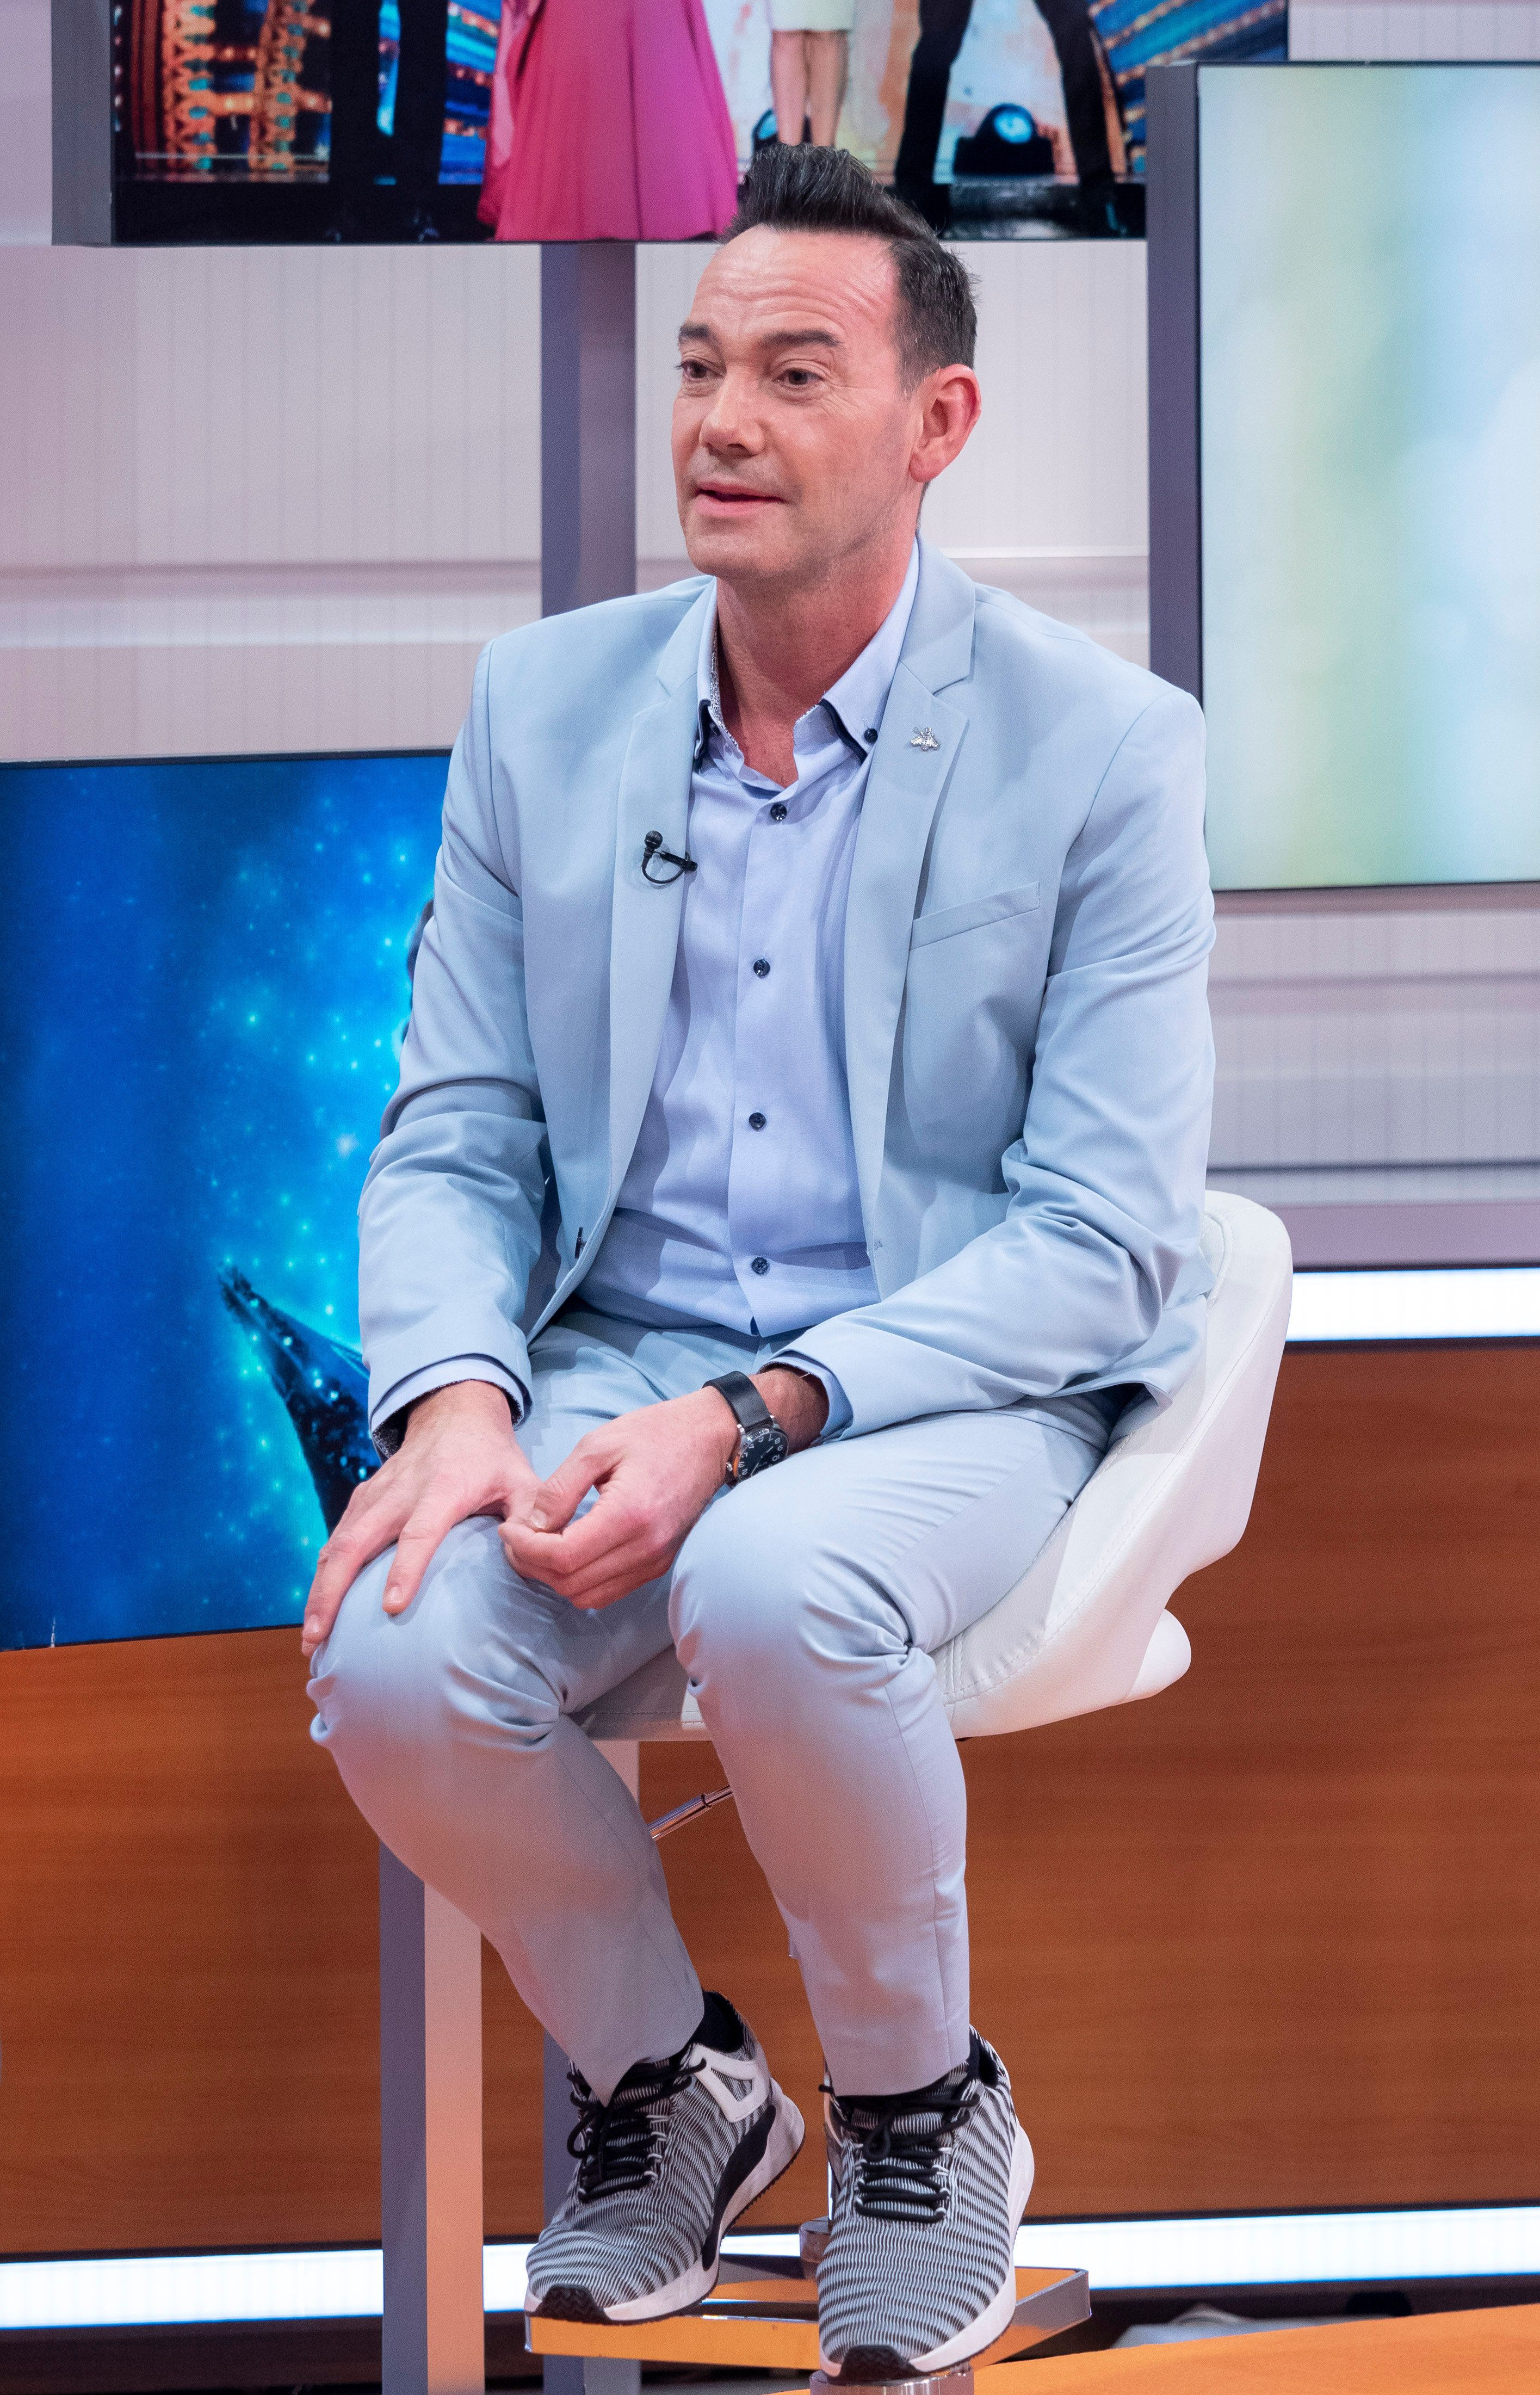 Craig Revel Horwood Admits He's Made New Boyfriend Sign Non-Disclosure